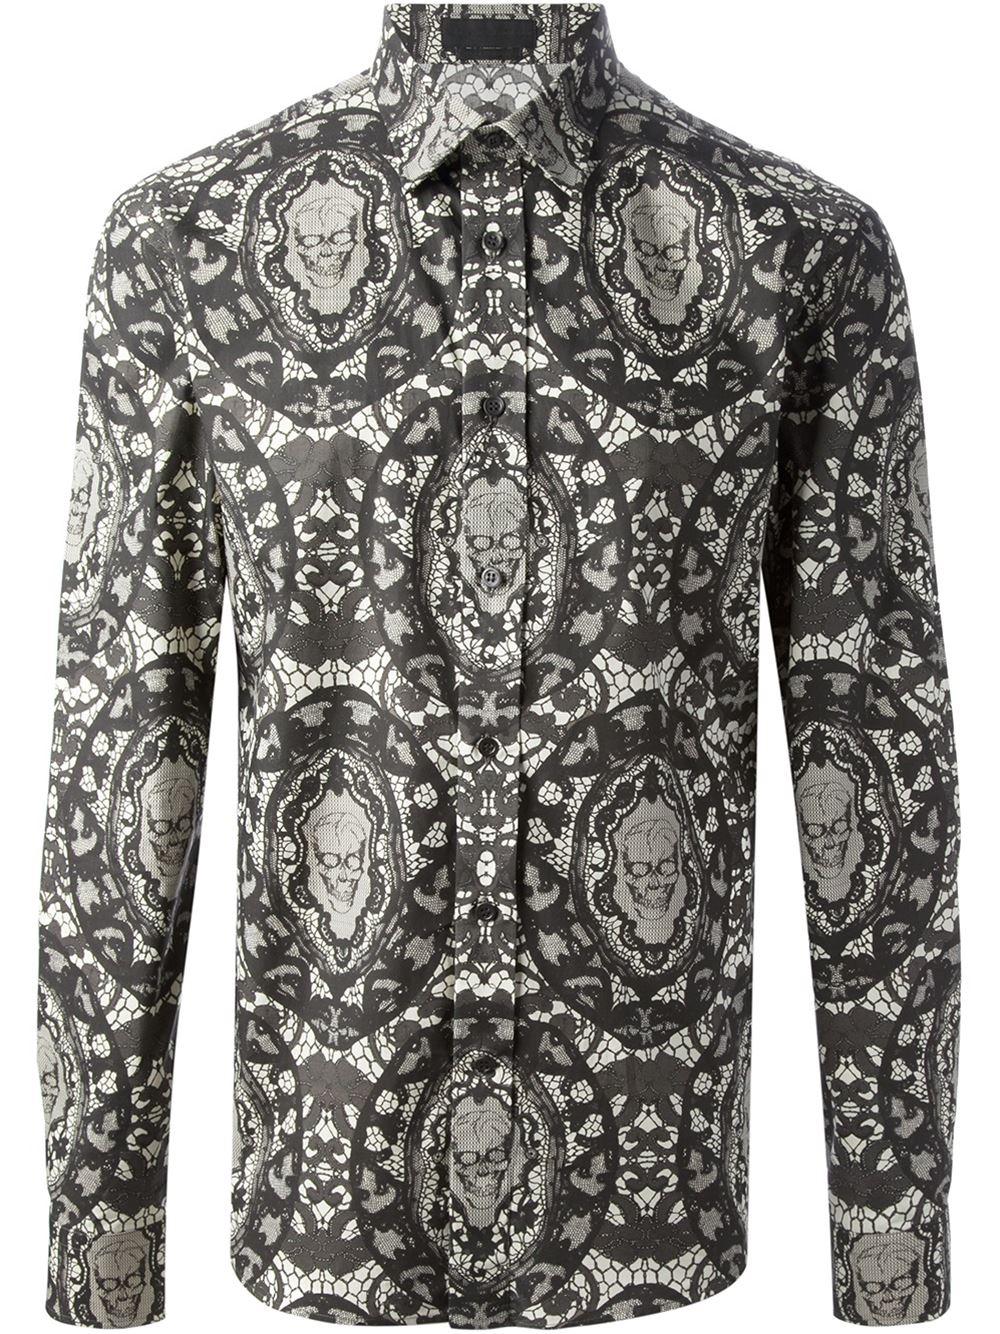 Alexander Mcqueen Skull And Lace Print Shirt - Jean Pierre Bua - Farfetch.com